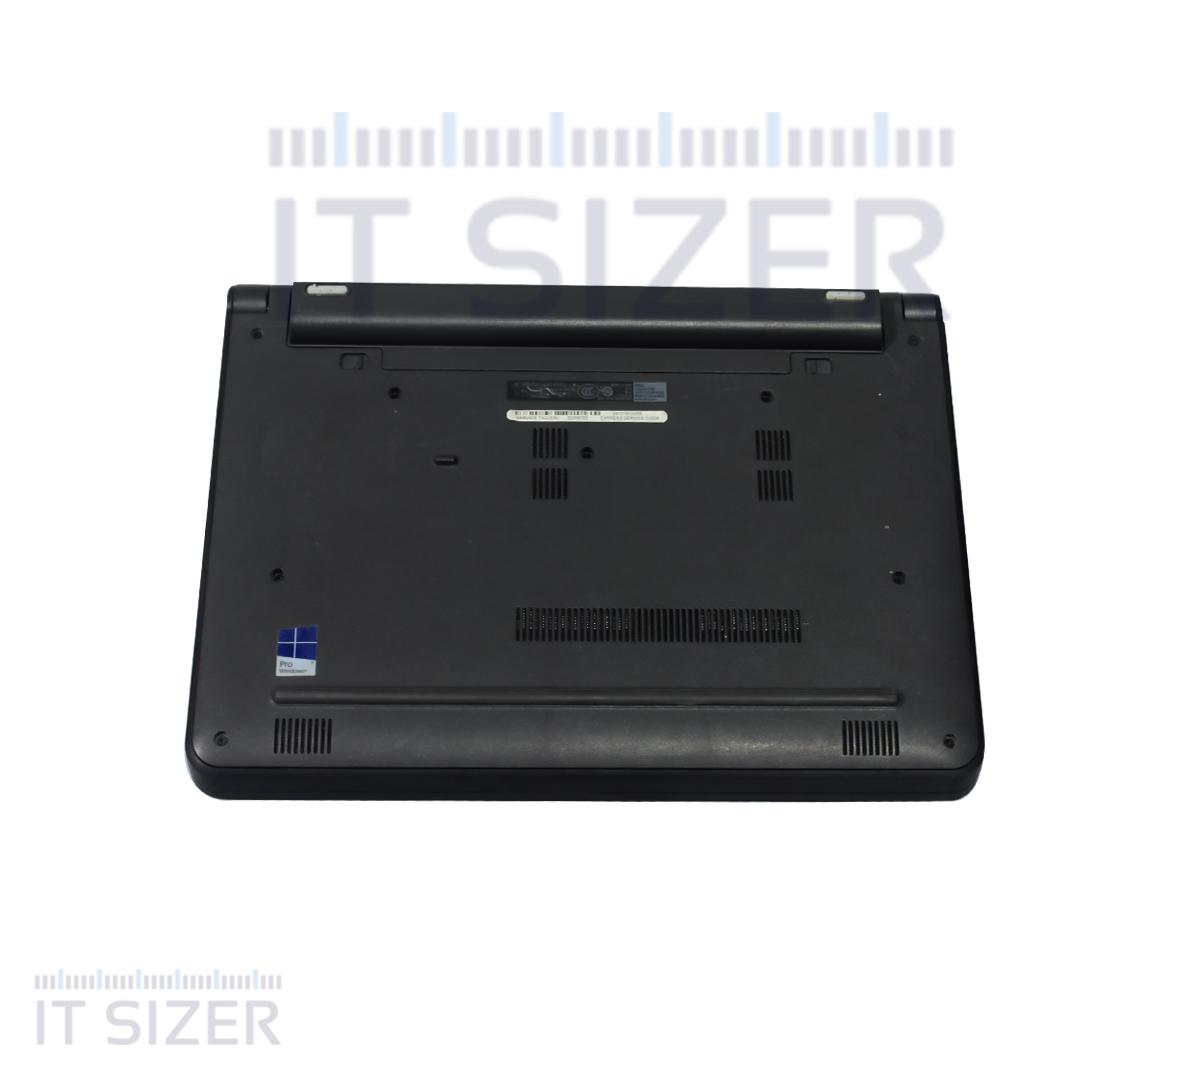 Dell latitude 3340 Business Laptop, Intel Core i5-4210U CPU, 8GB DDR3L SODIMM RAM, 250GB SATA 2.5 Hard, 13 inch Display, Windows 10 Pro (Renewed)